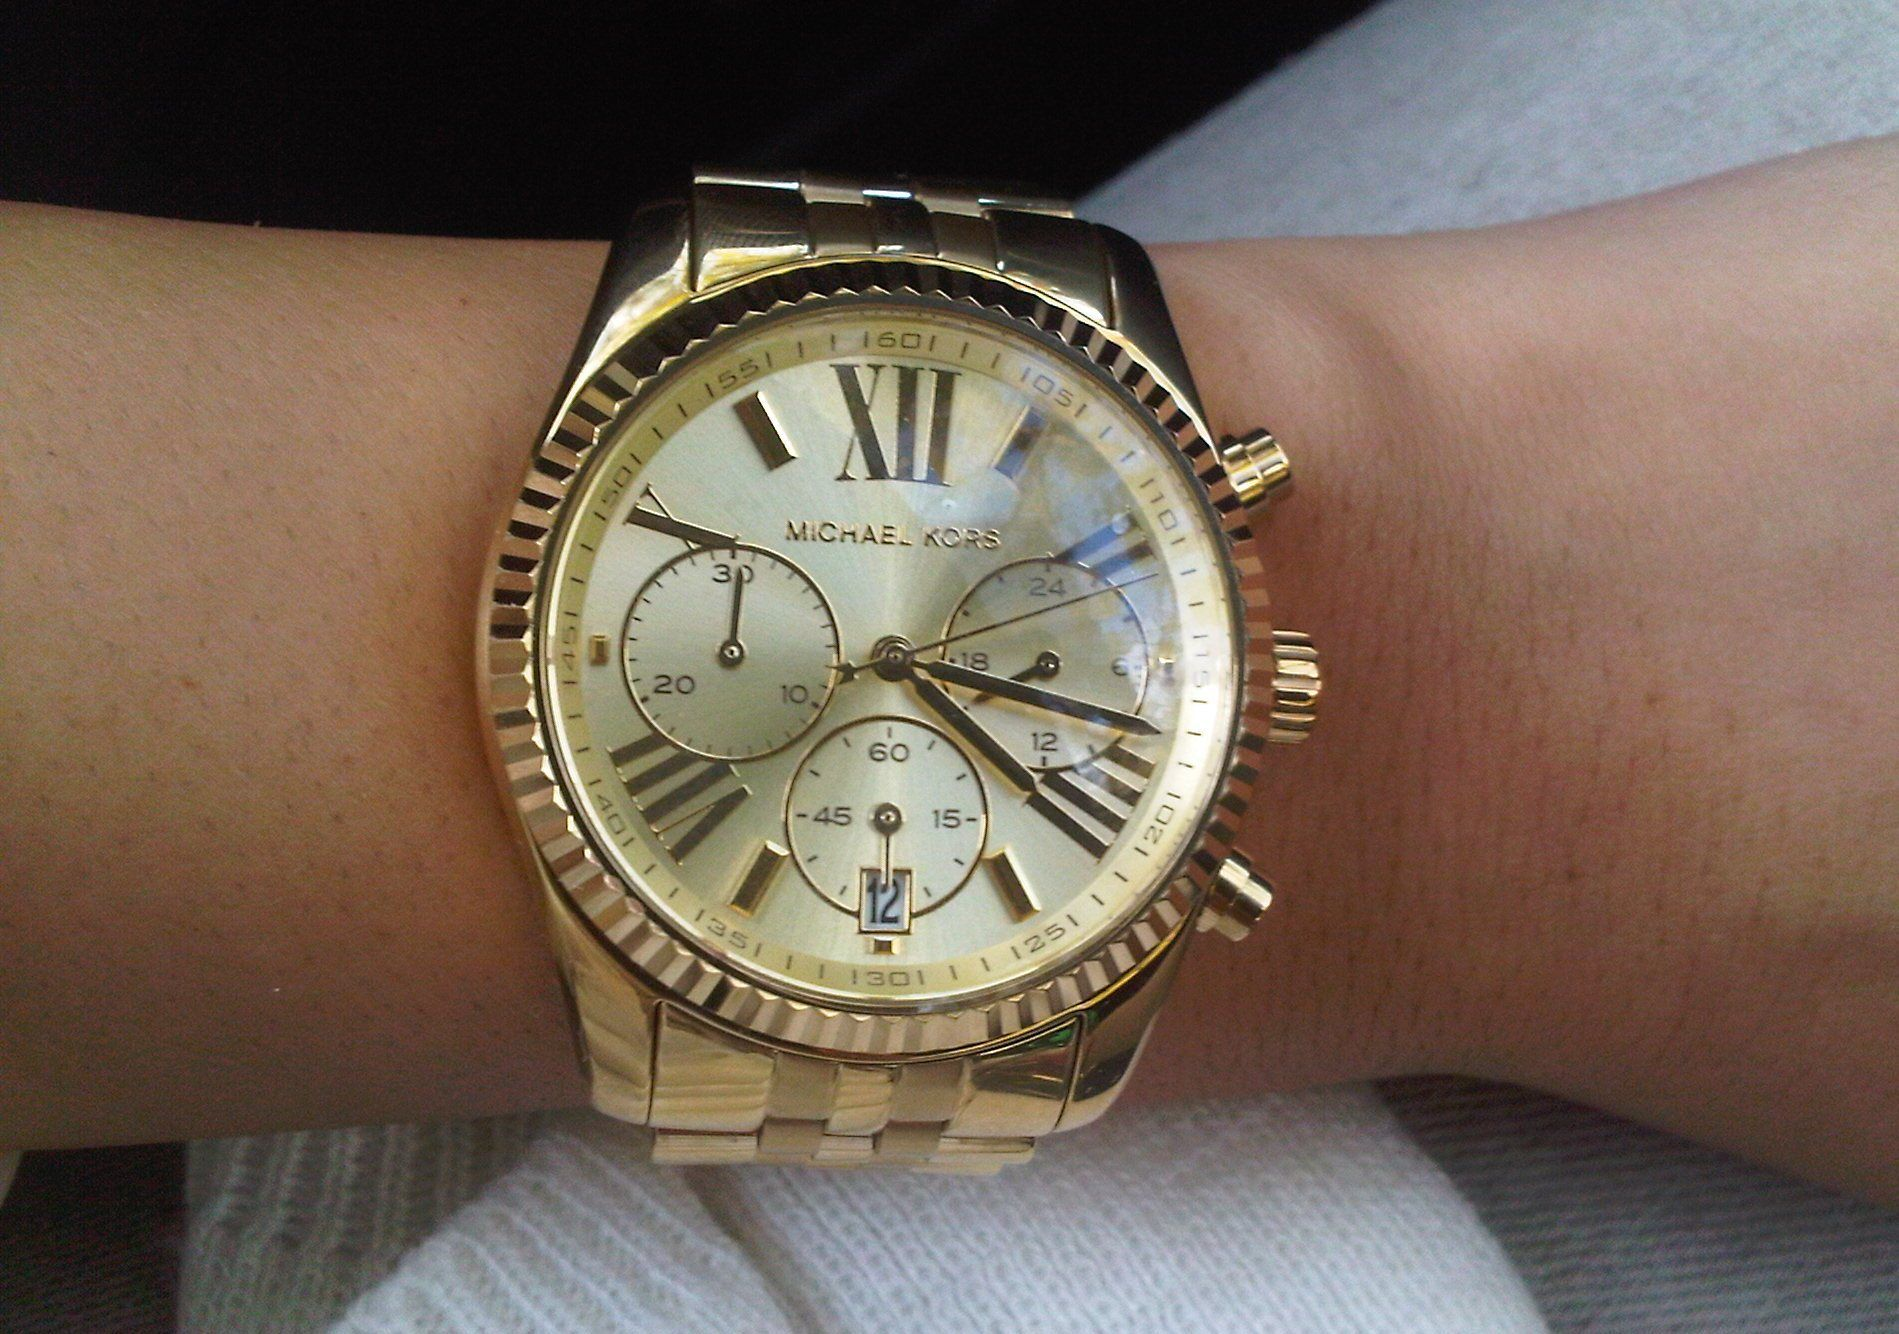 Mk Watch, Michael Kors Watch, Michael O'keefe, Fossil, Watches,